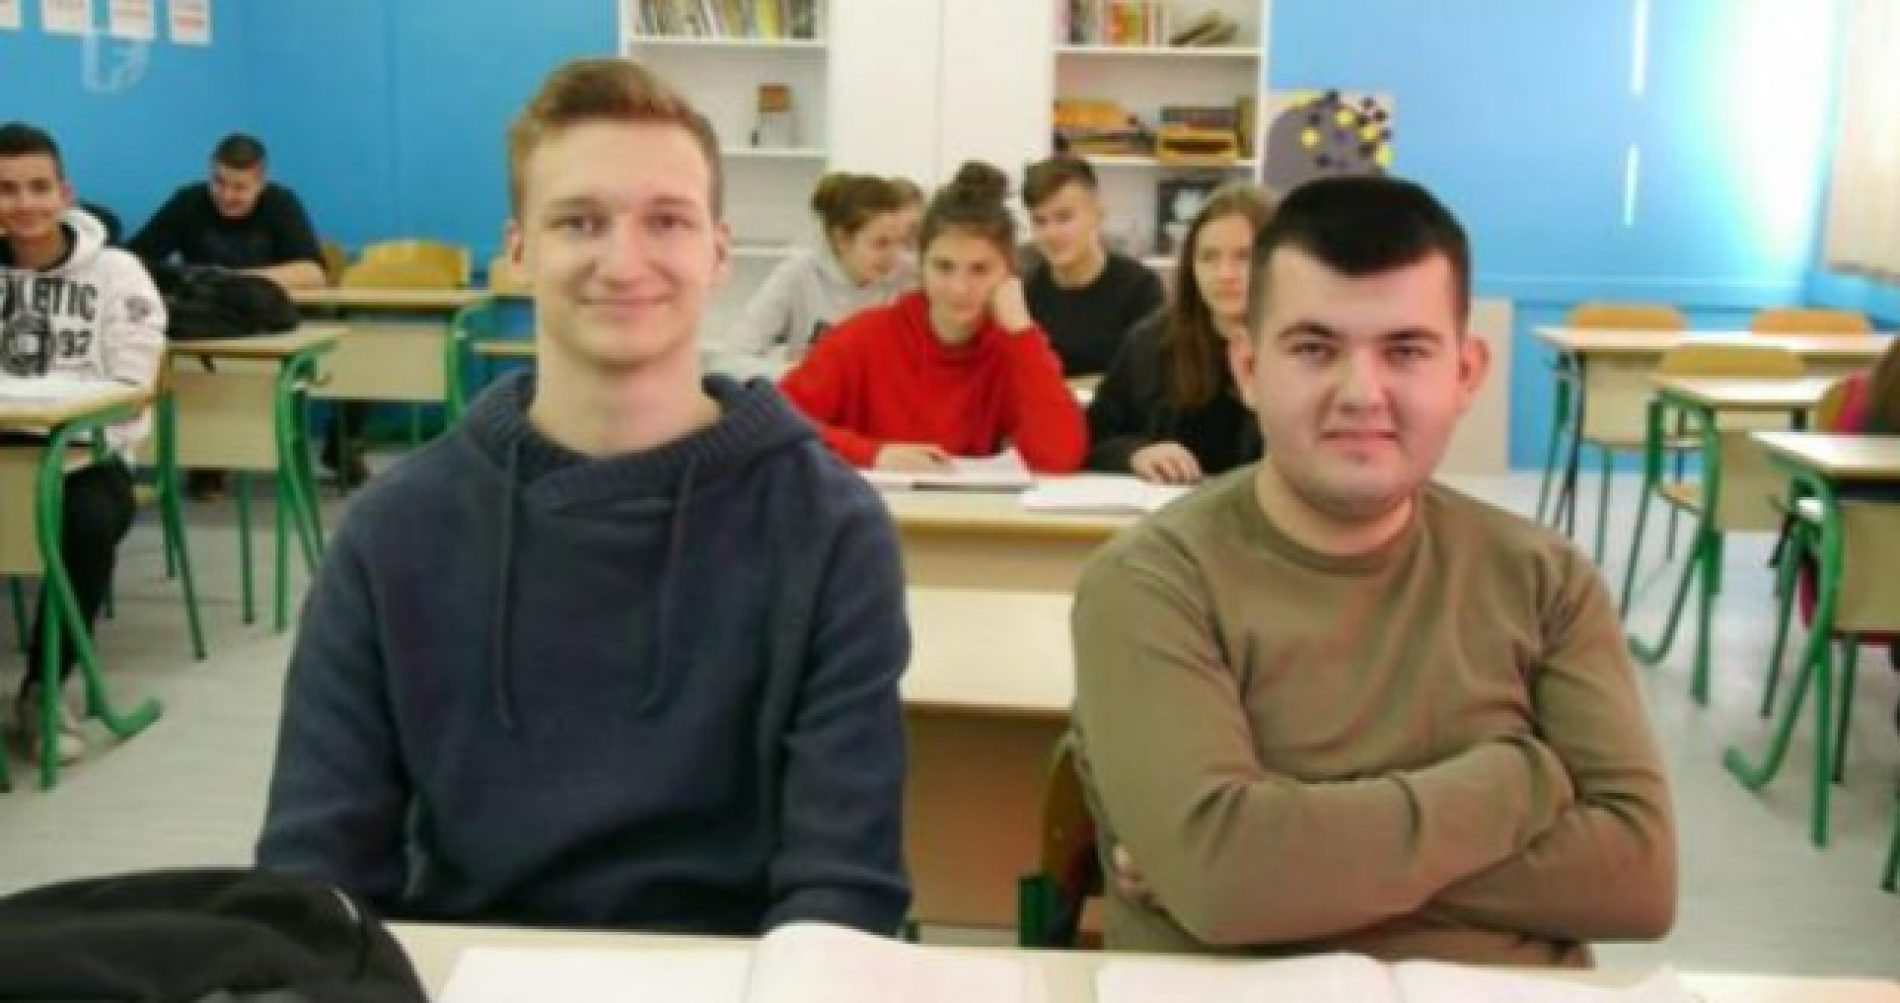 Takmičenje iz matematike: Ahmed i Amel prvi i treći u Evropi